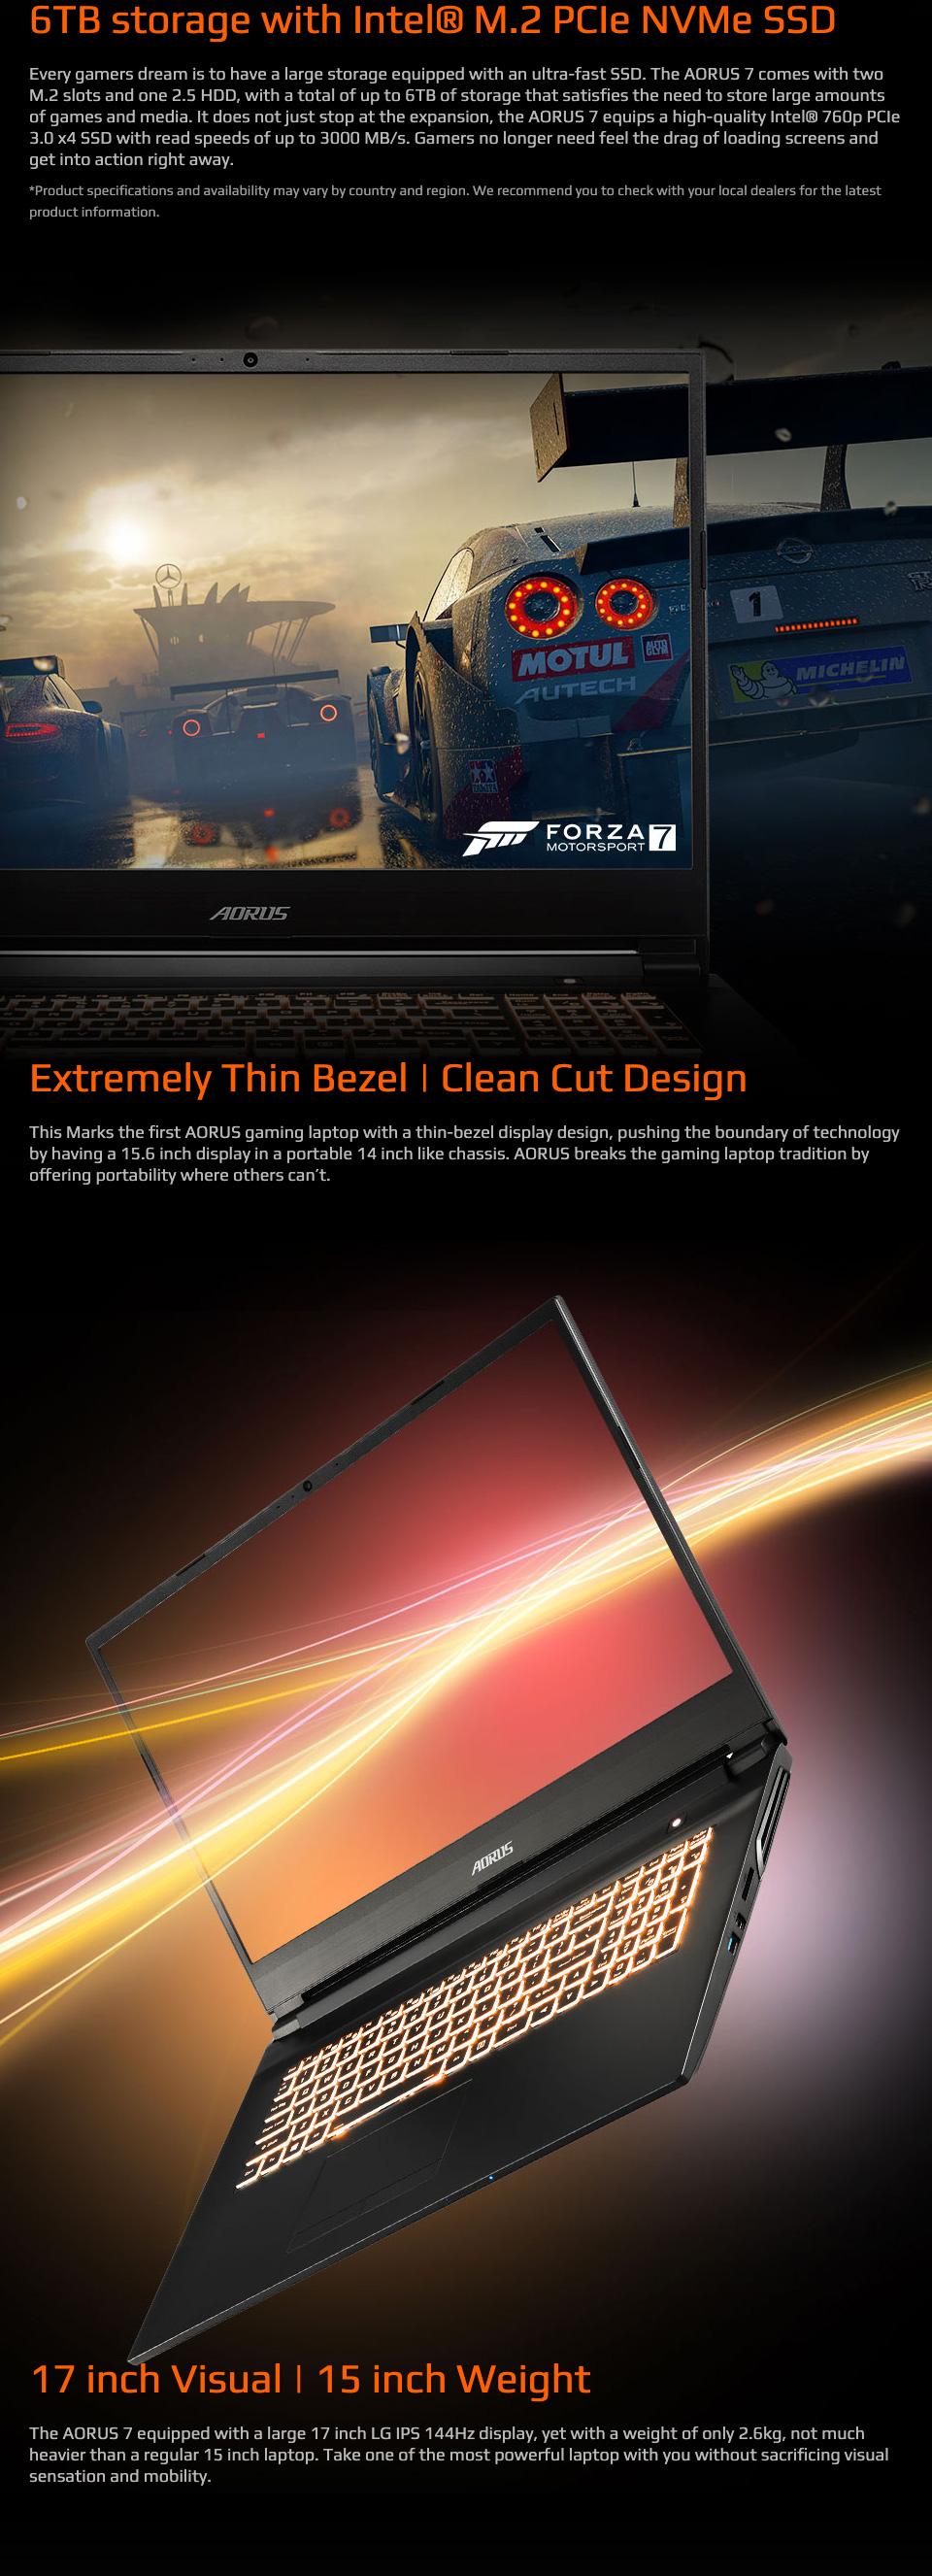 Gigabyte Aorus 7 Core i7 GTX 1660Ti 17.3in 144 Hz Notebook features 5